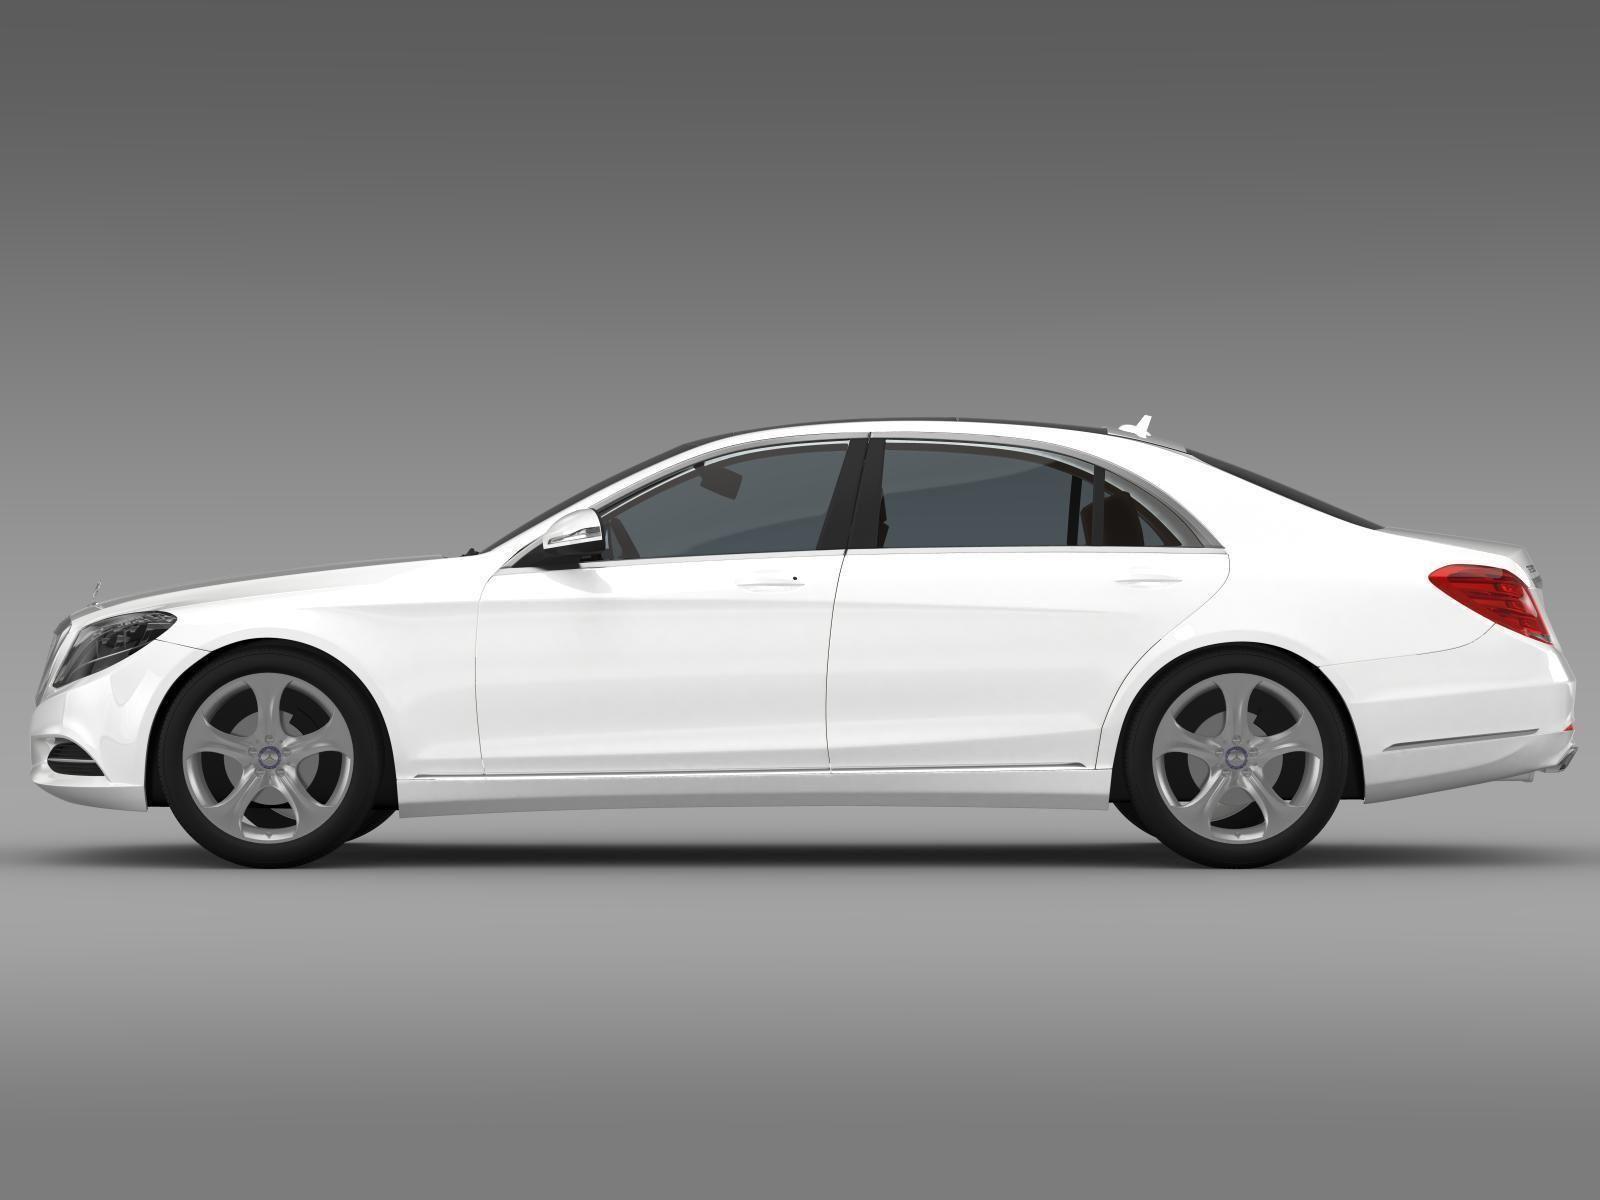 Mercedes benz s 500 plug in hybrid w222 2013 3d model max for Mercedes benz hybrid models